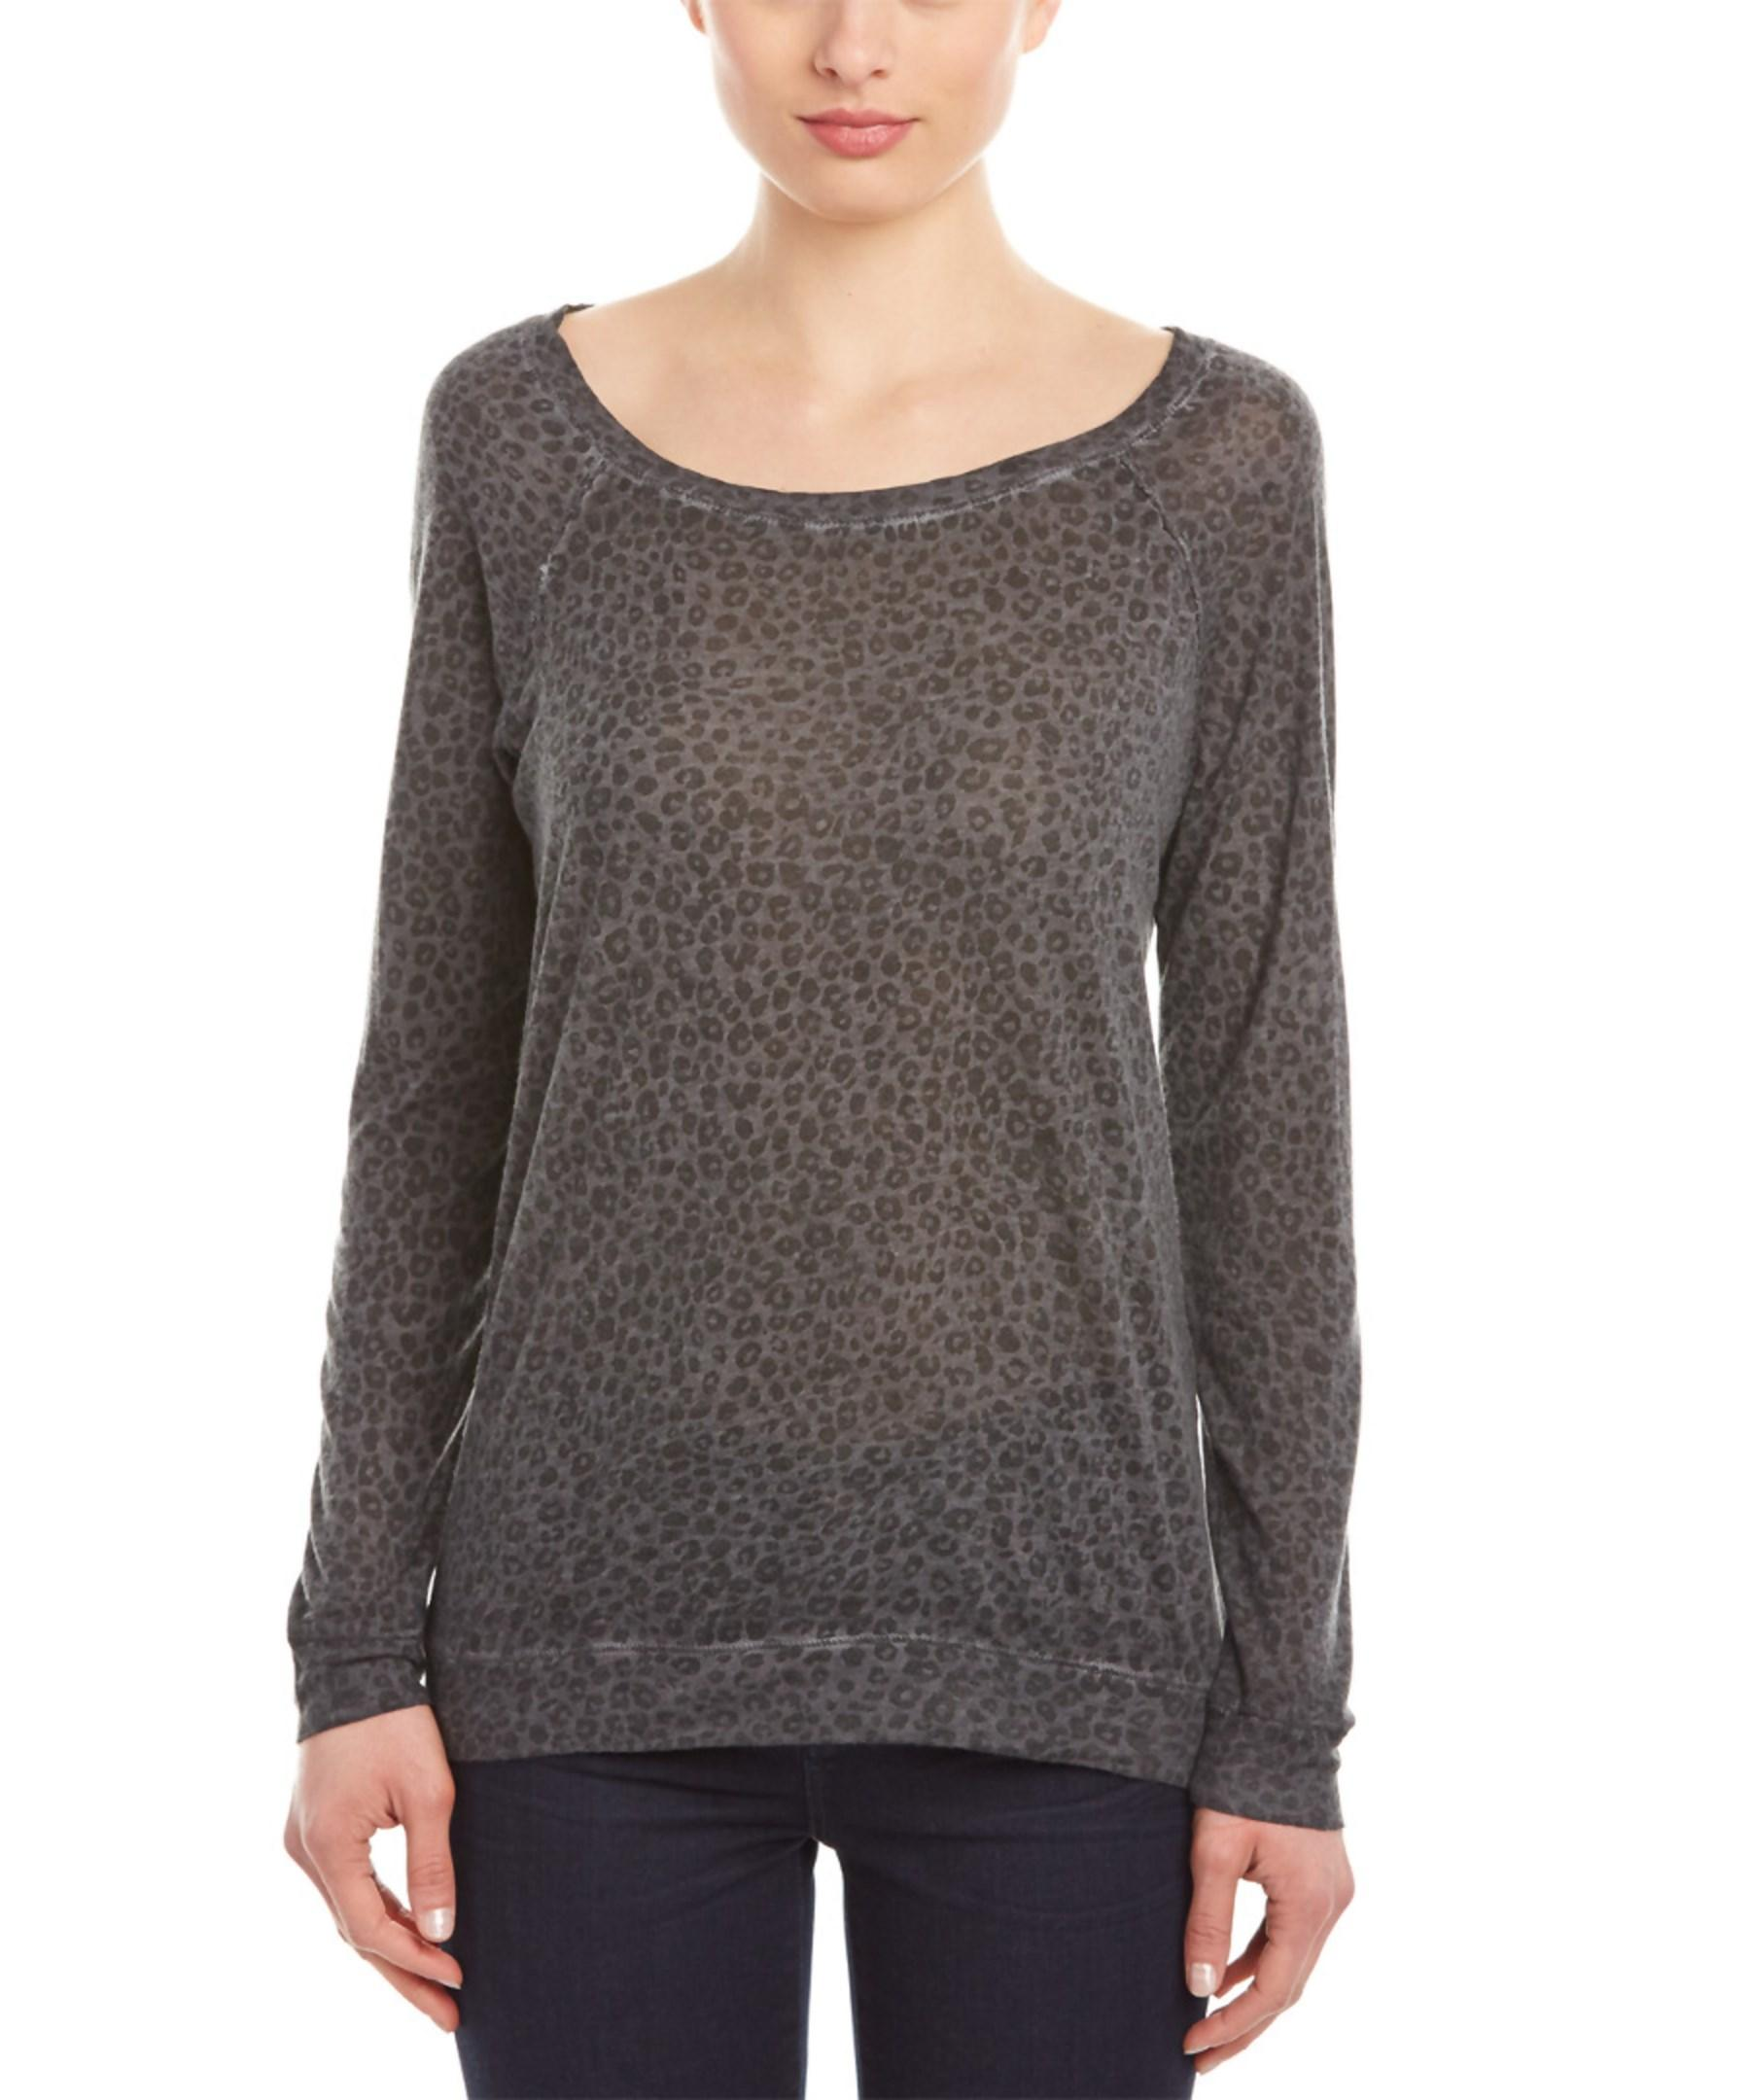 Majestic Filatures Cashmere Silk Blend Sweatshirt In